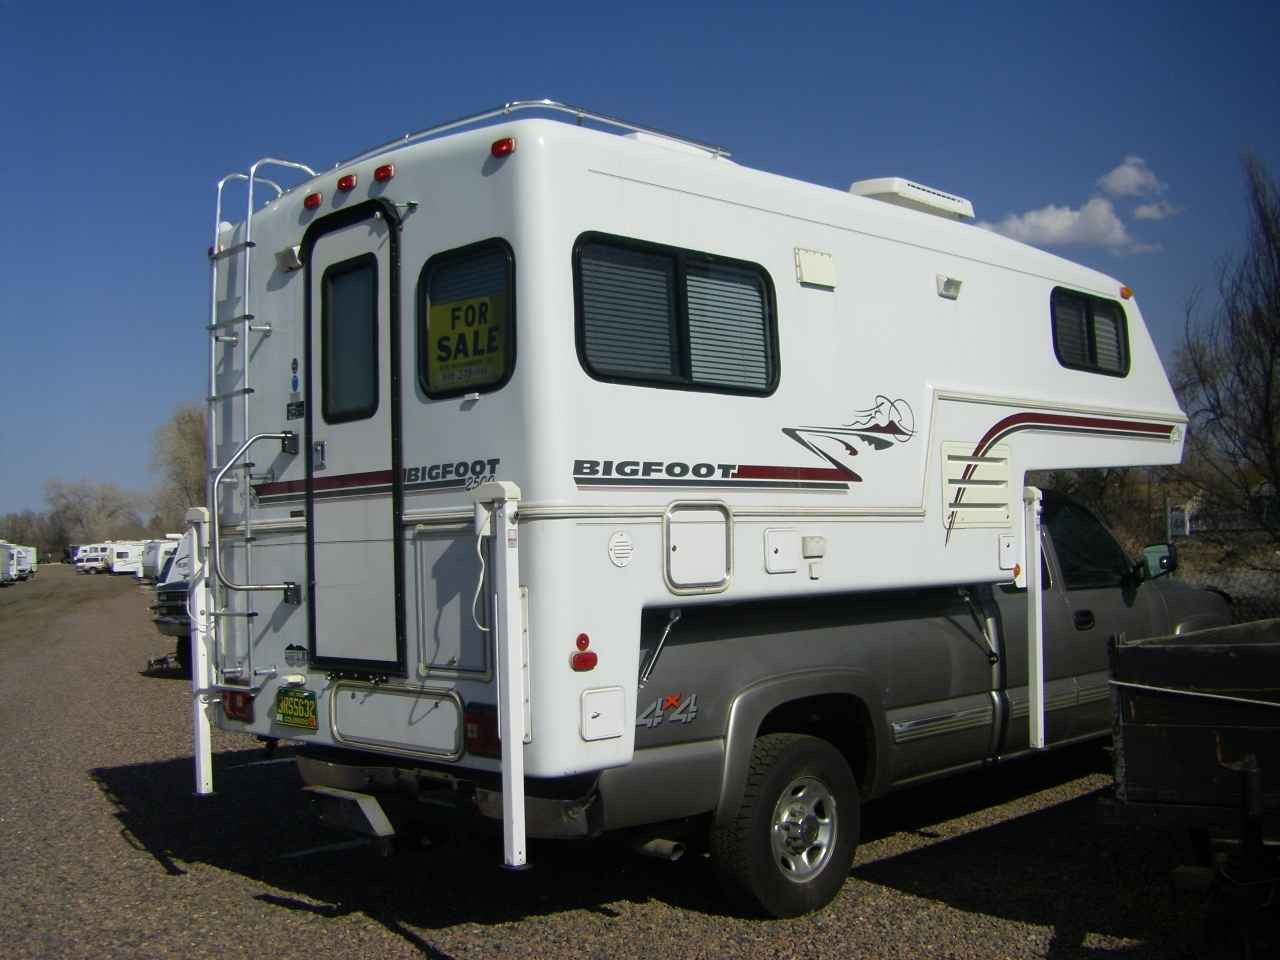 1999 Used Bigfoot 2500 SERIES 25C9 4LB Truck Camper in Colorado CO